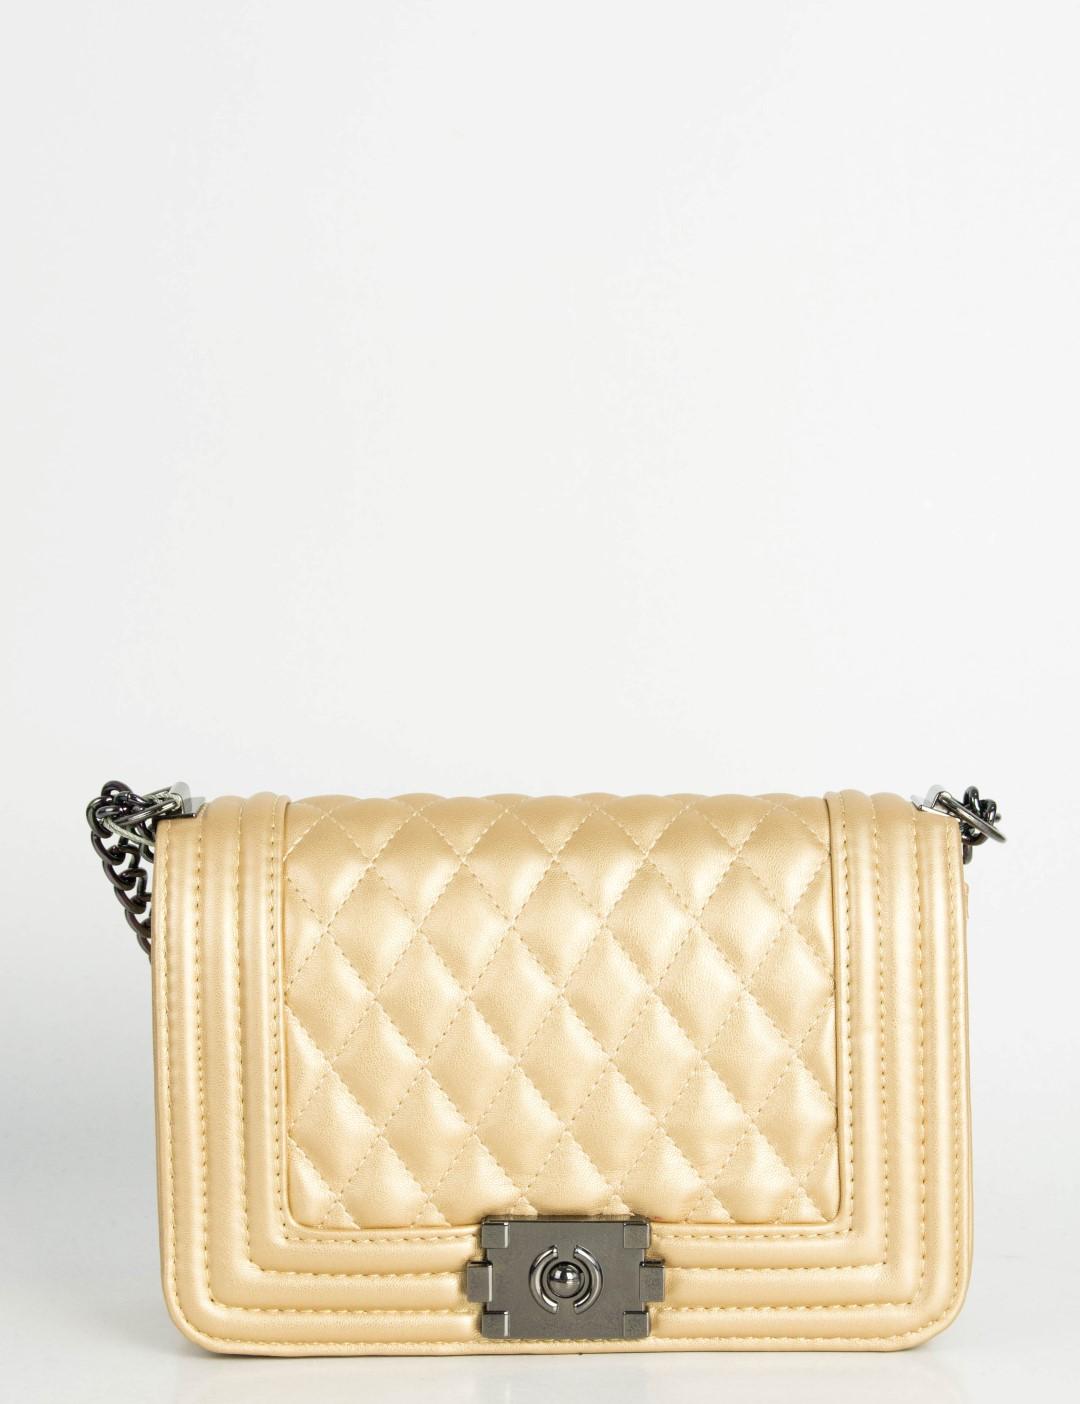 6ef69fee82 Γυναικεία χρυσή καπιτονέ τσάντα ανθρακί αλυσίδα M7836N